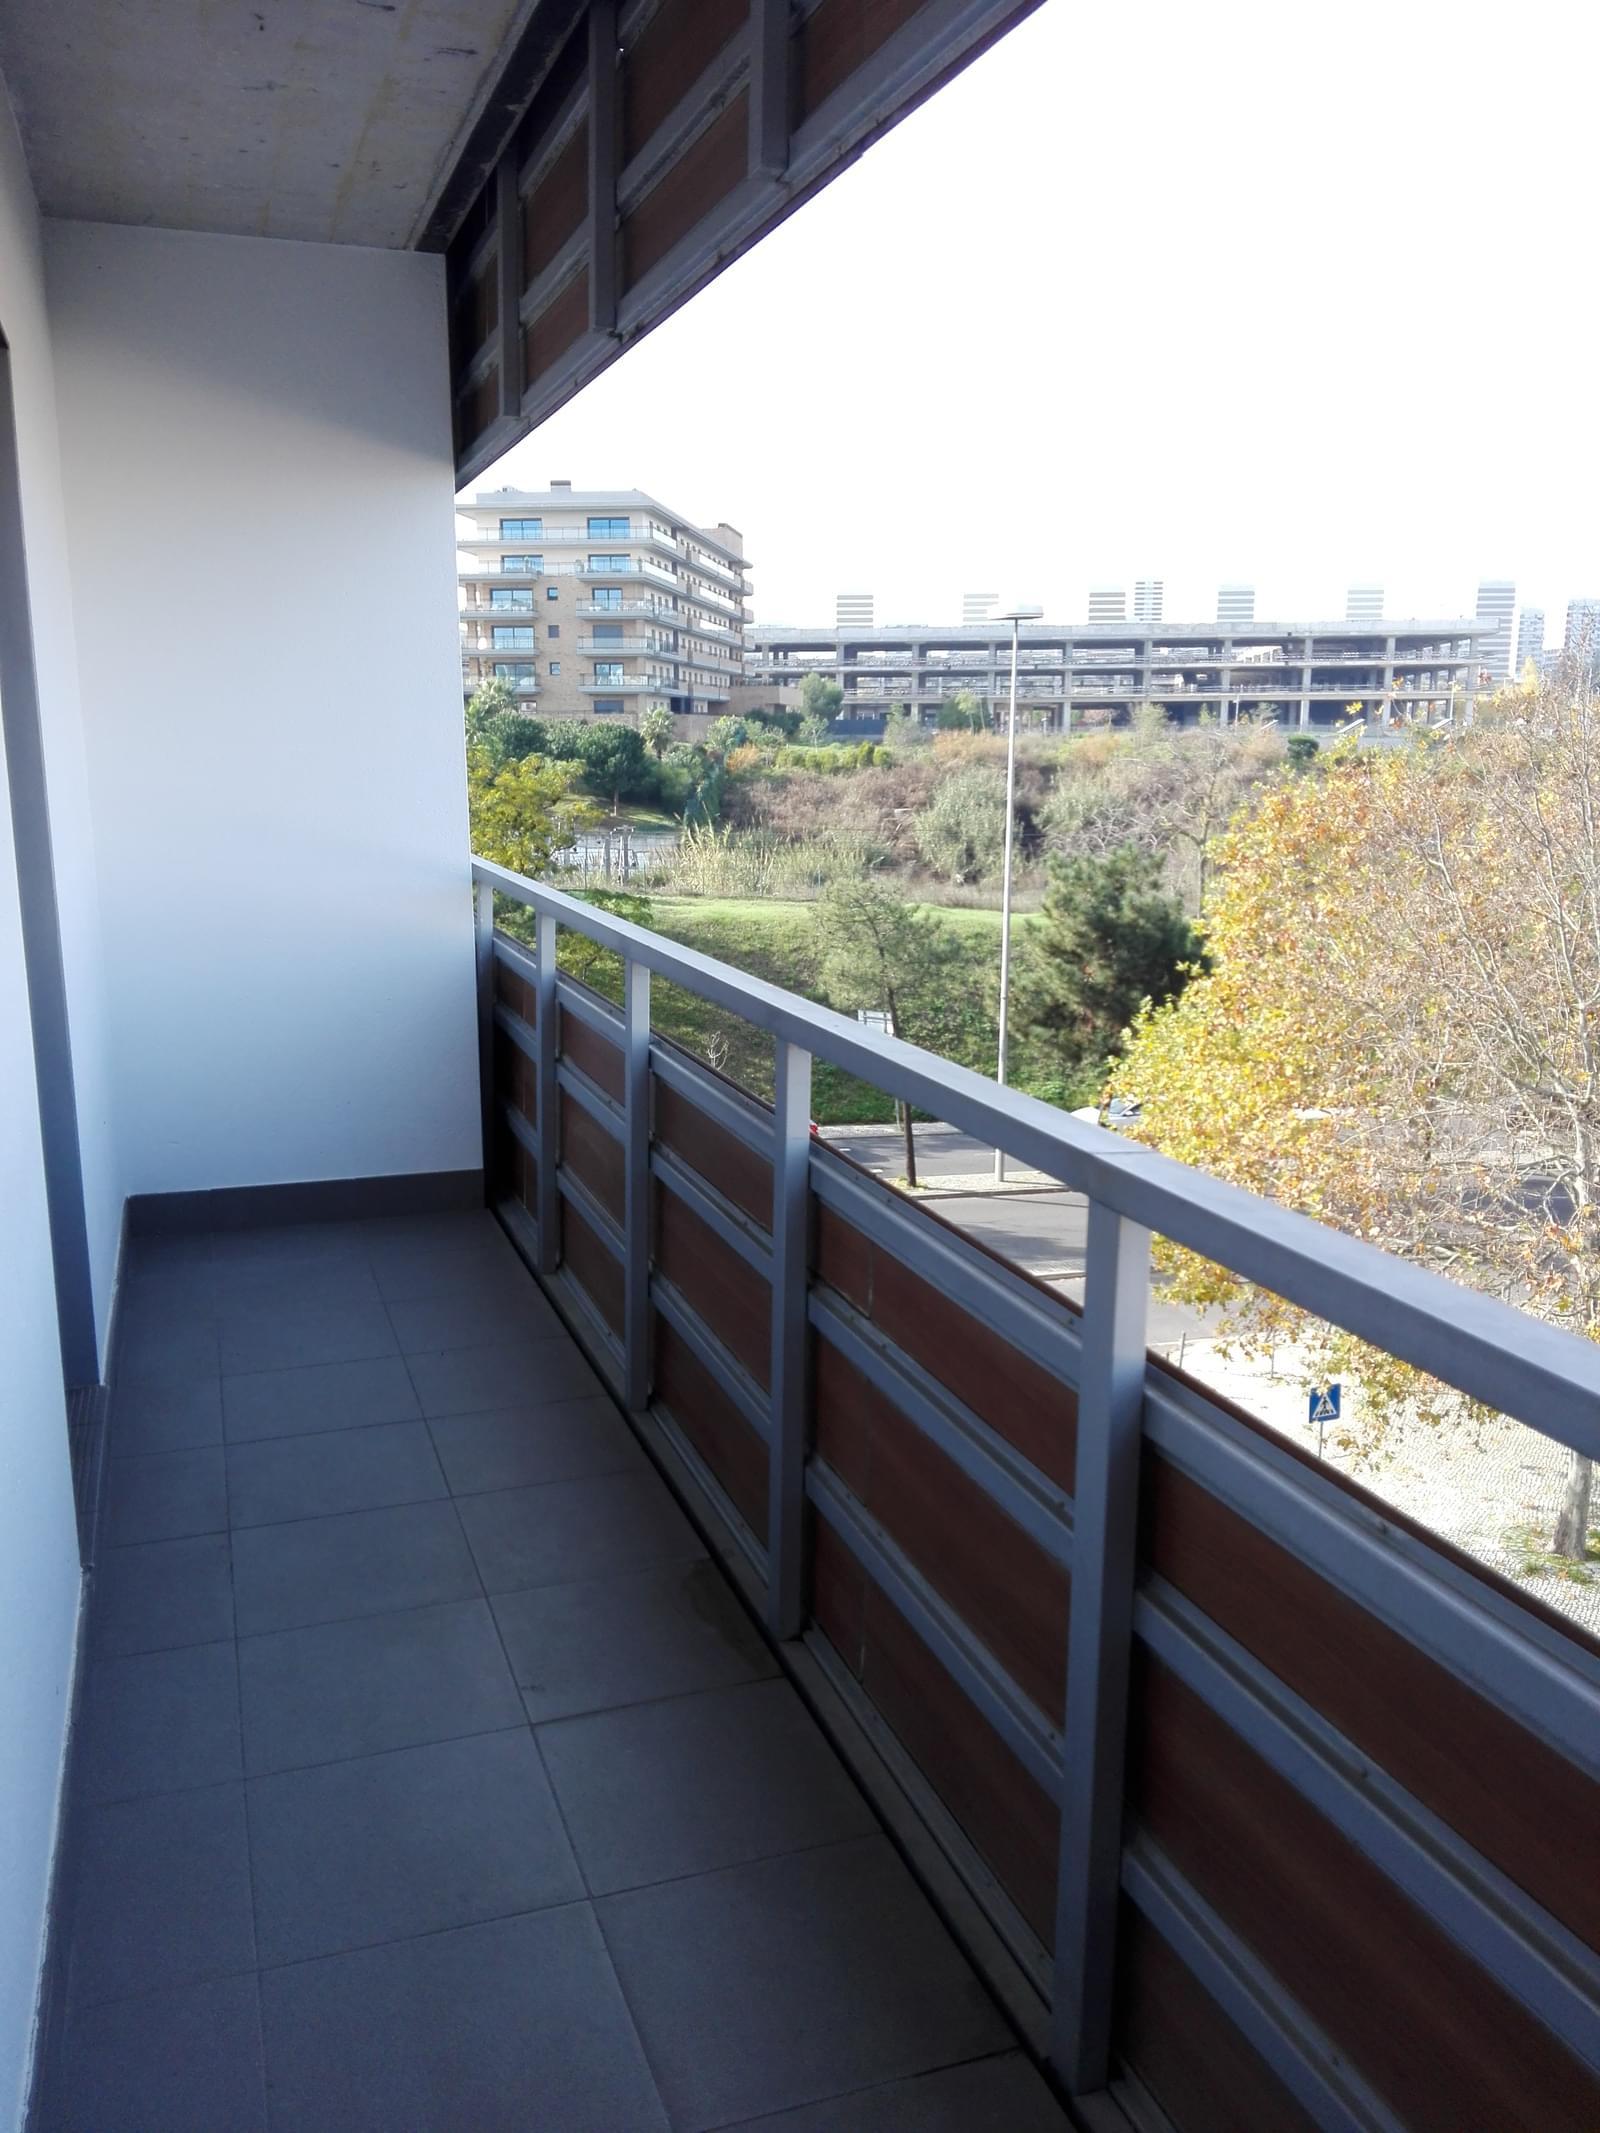 pf18814-apartamento-t2-lisboa-7f2e25da-fed1-4937-86a4-aa84c5c38f9c